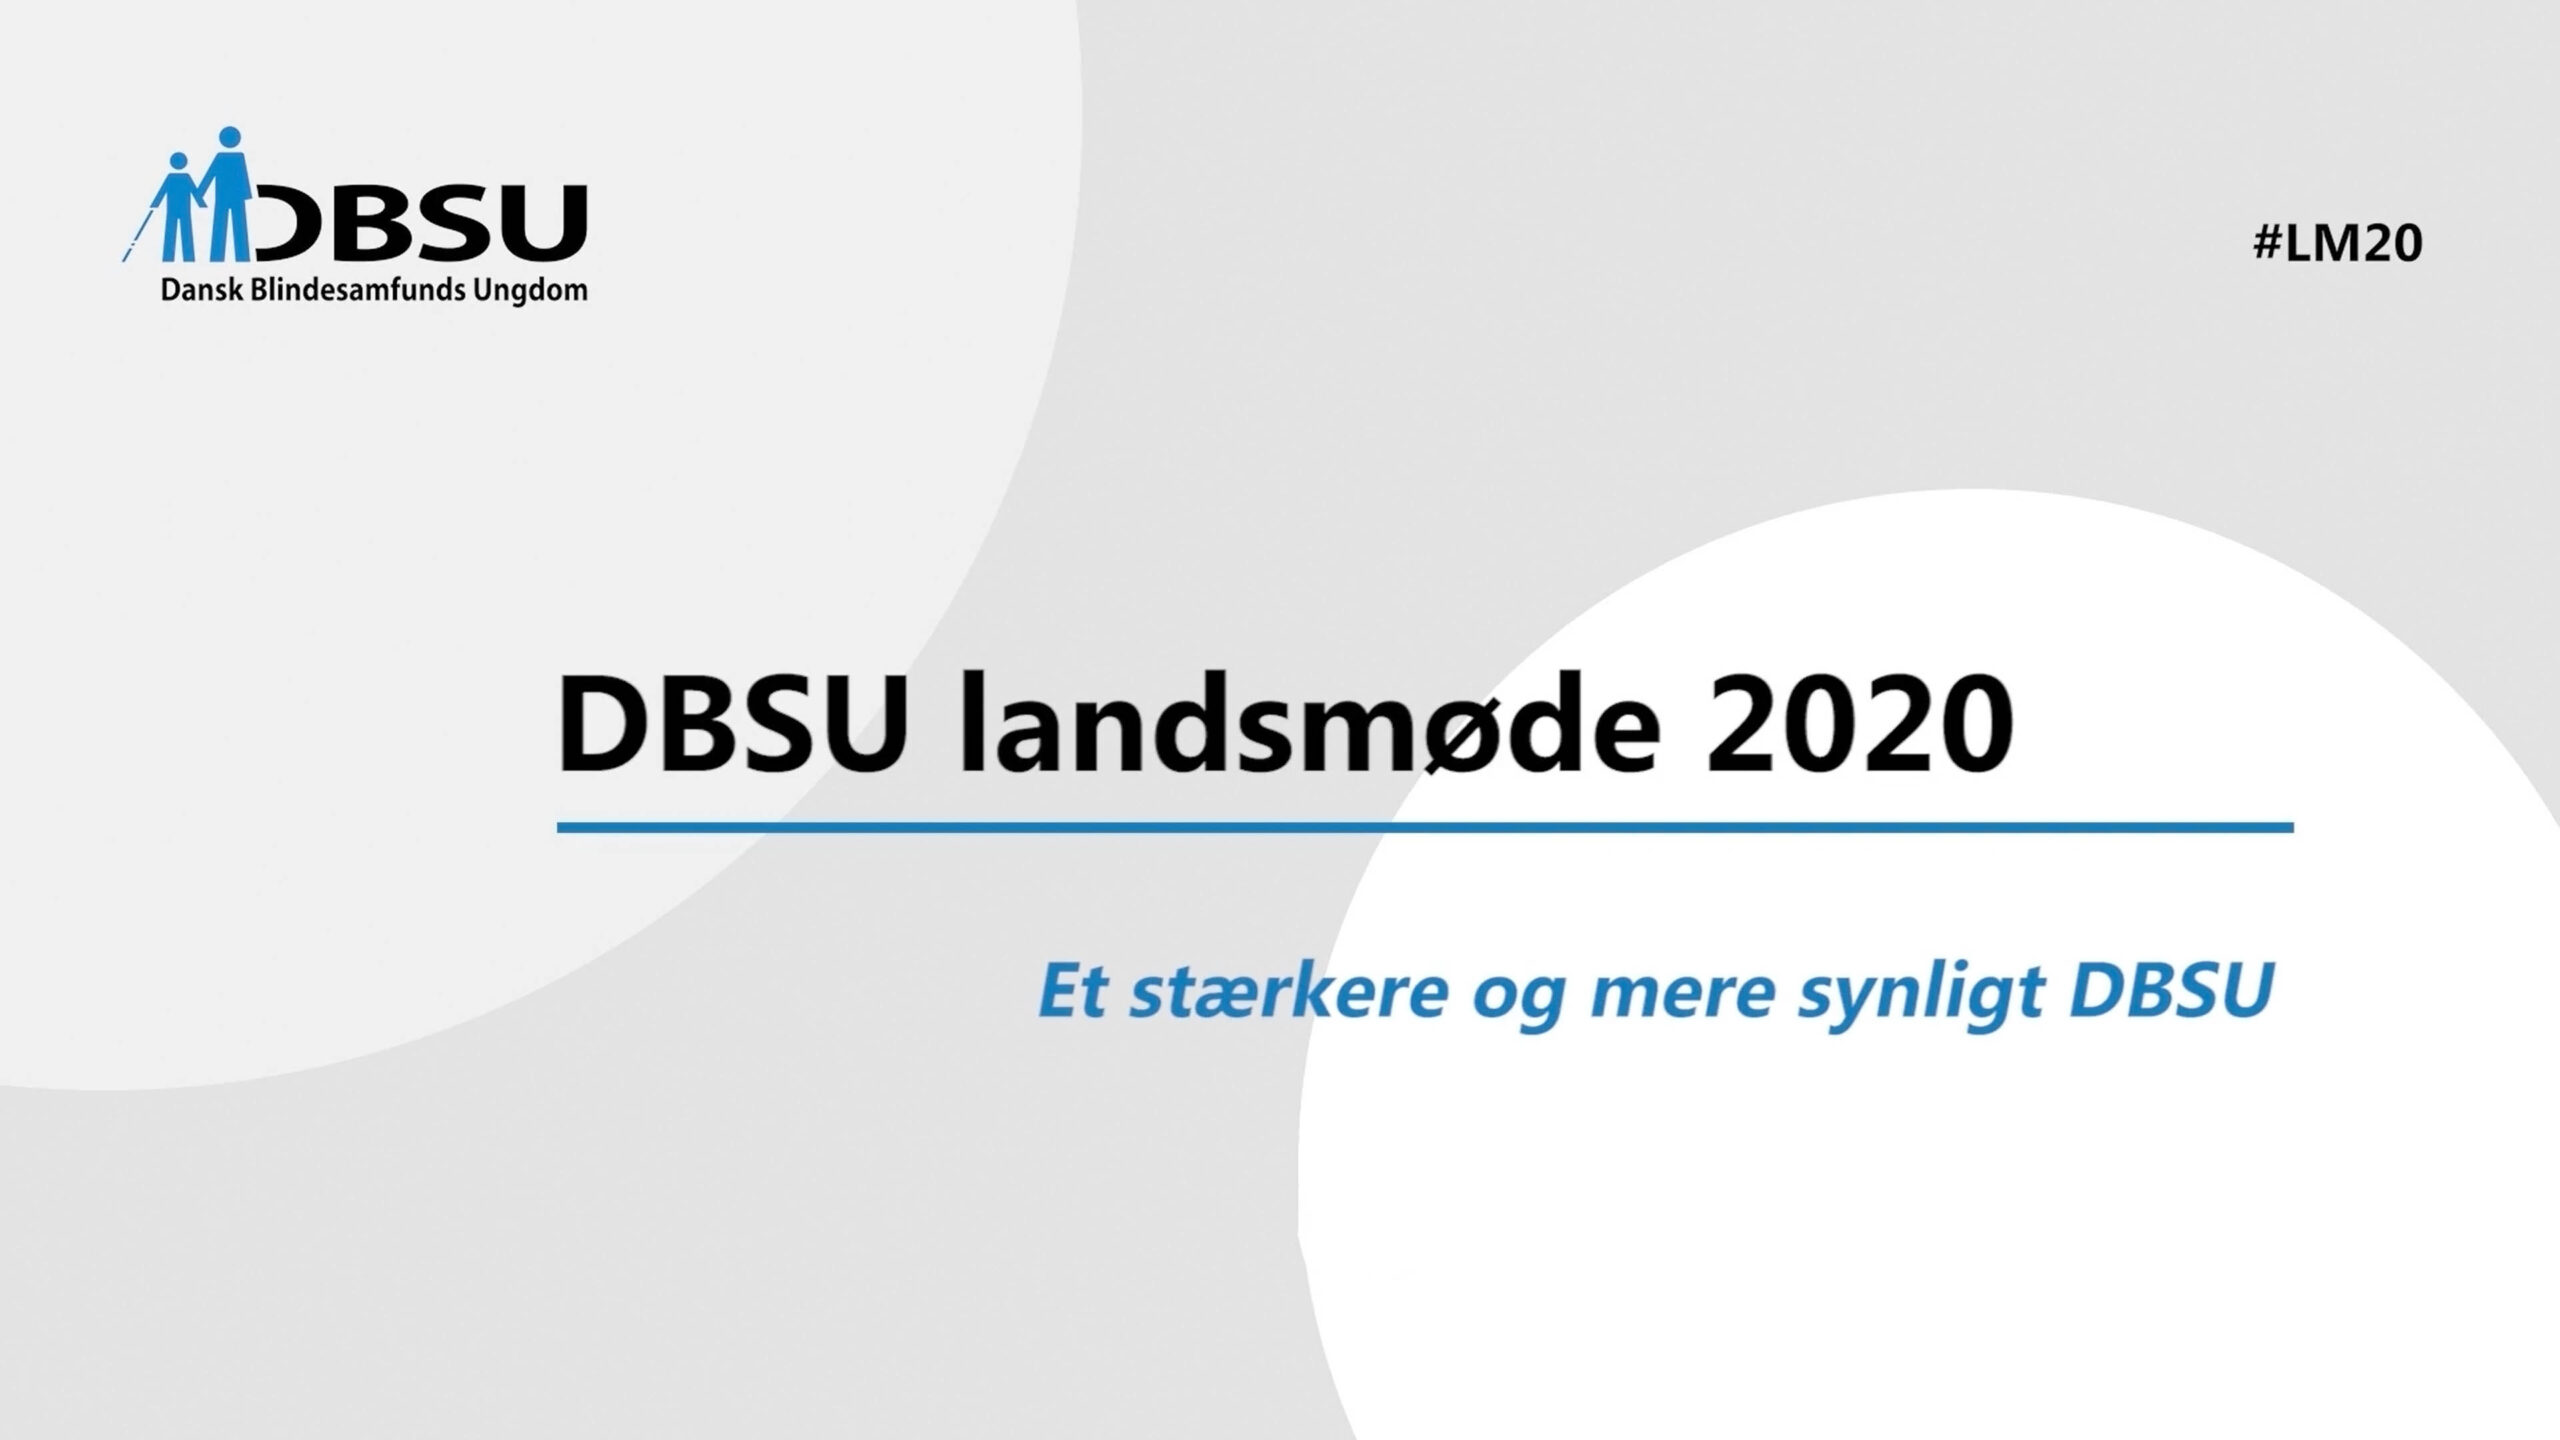 referat fra dbsu landsmoede 2020 scaled